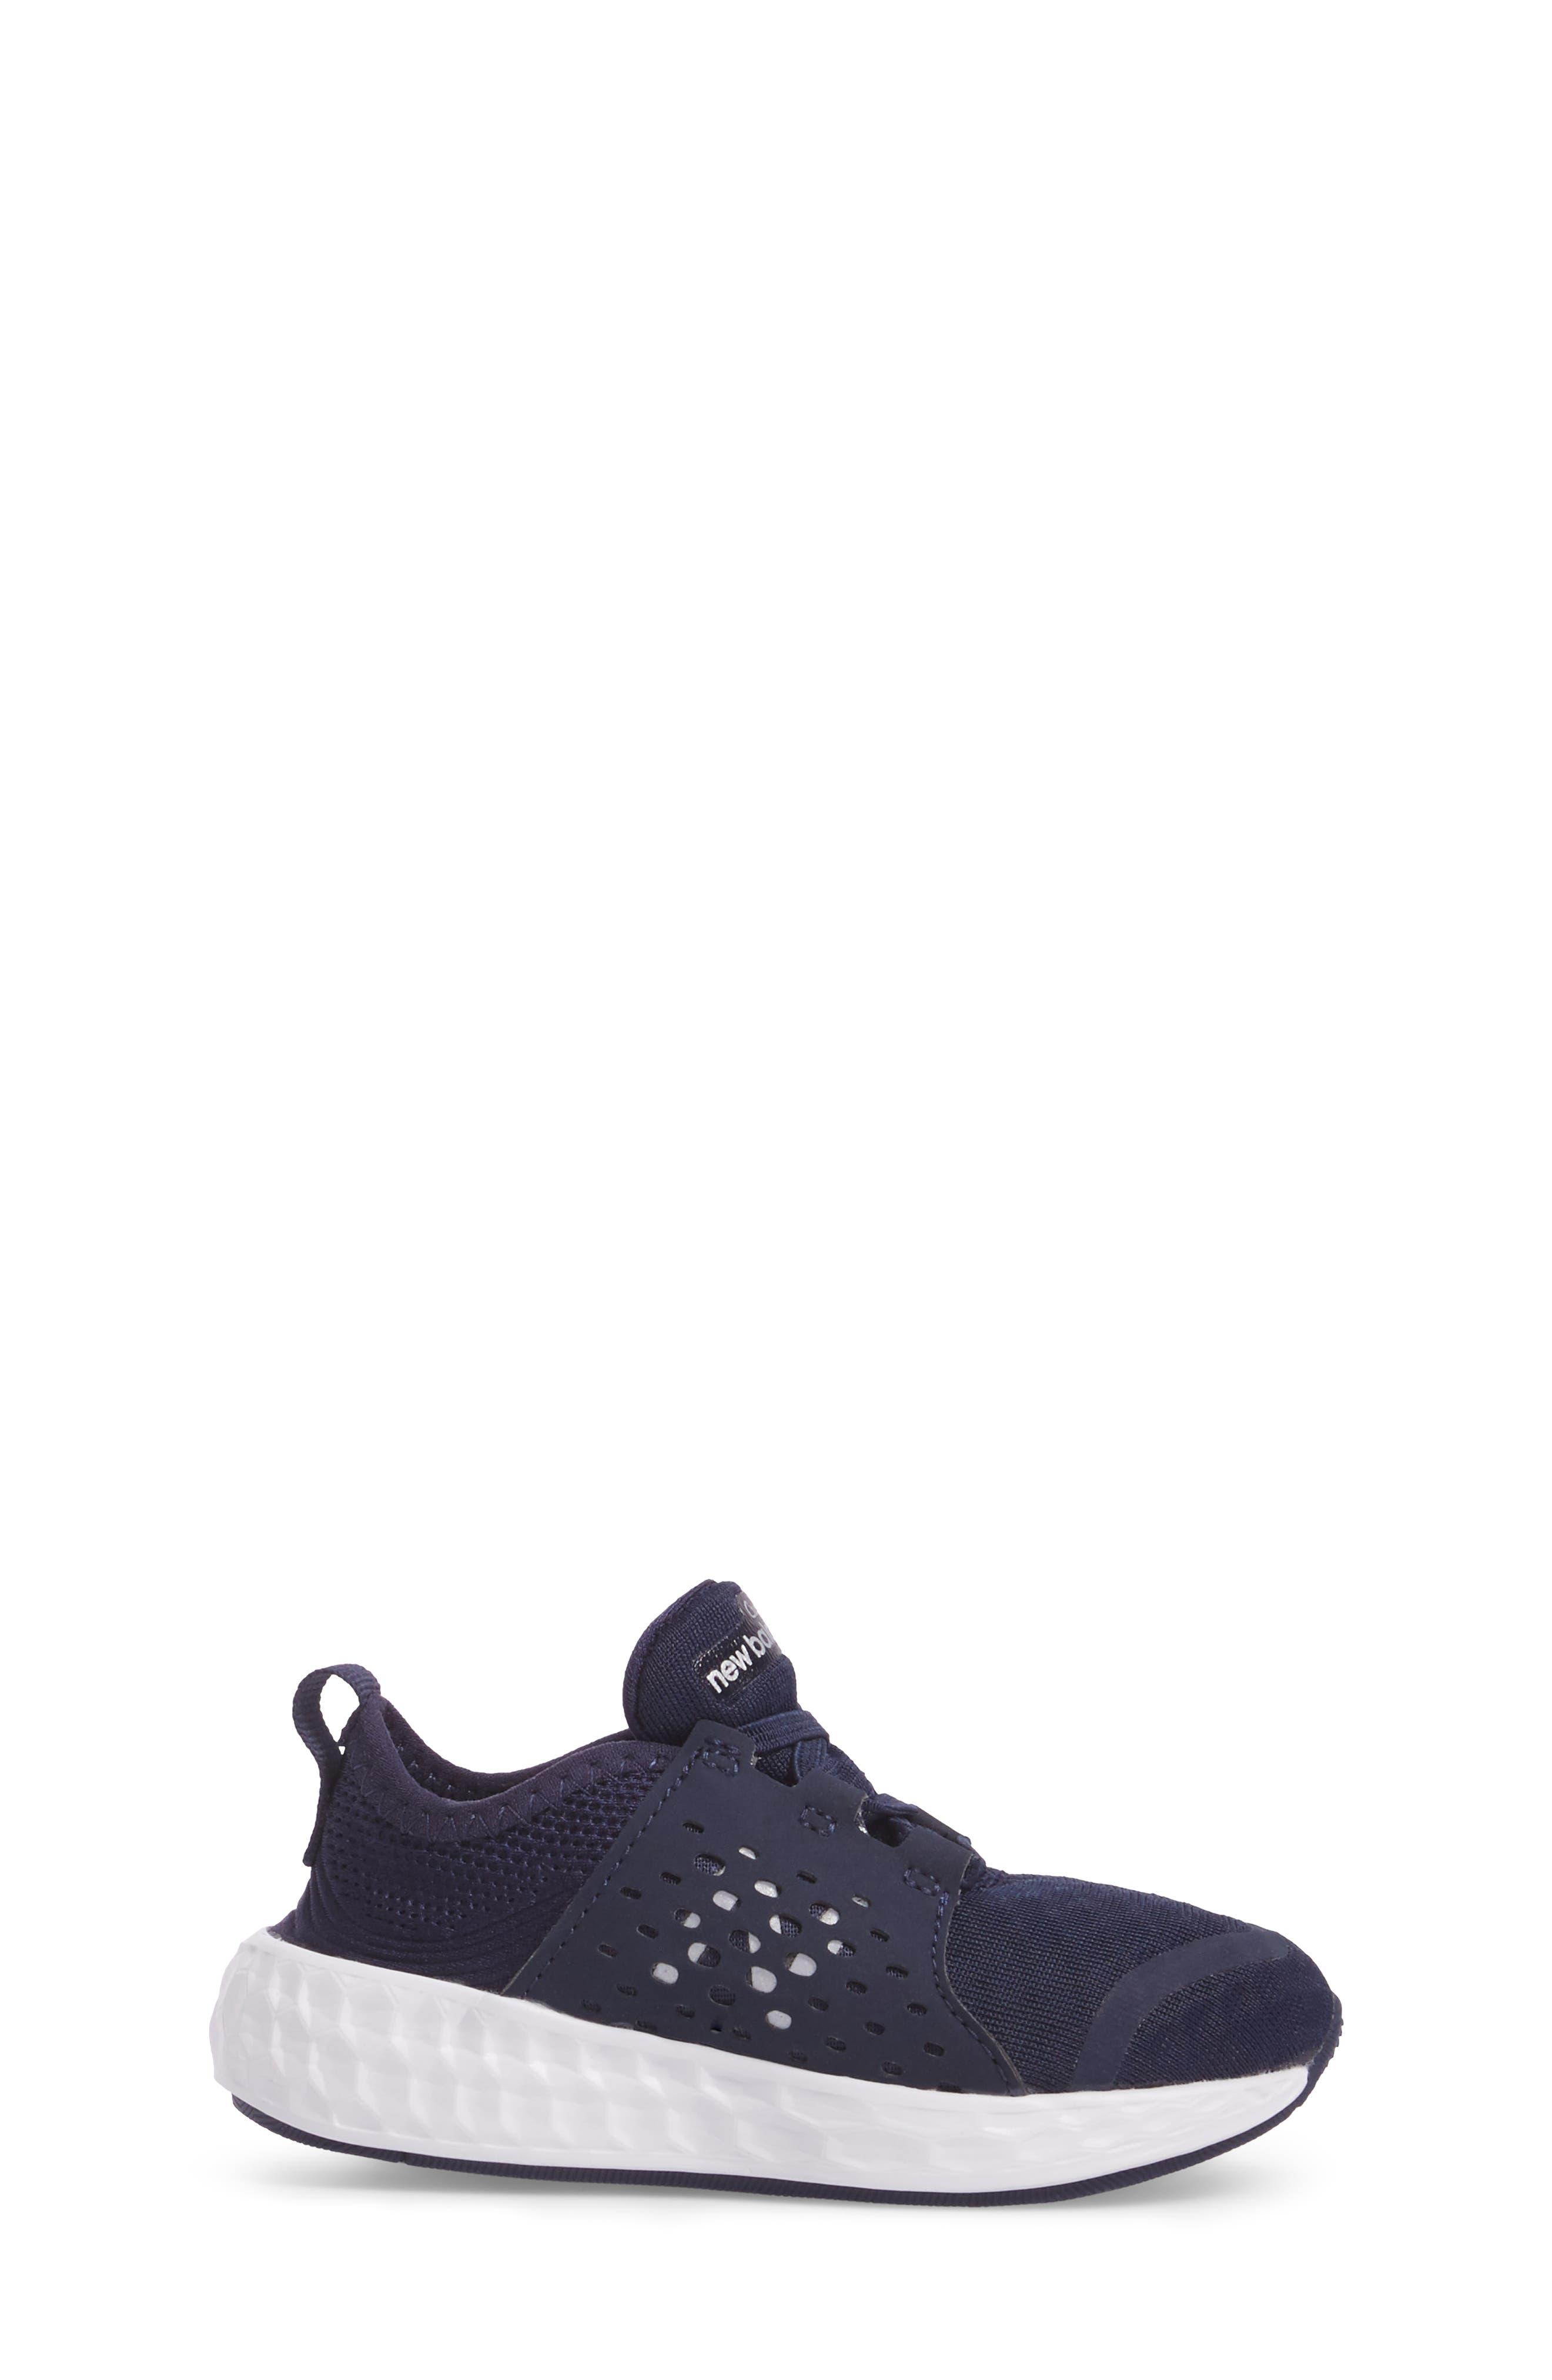 Cruz Sport Sneaker,                             Alternate thumbnail 3, color,                             414